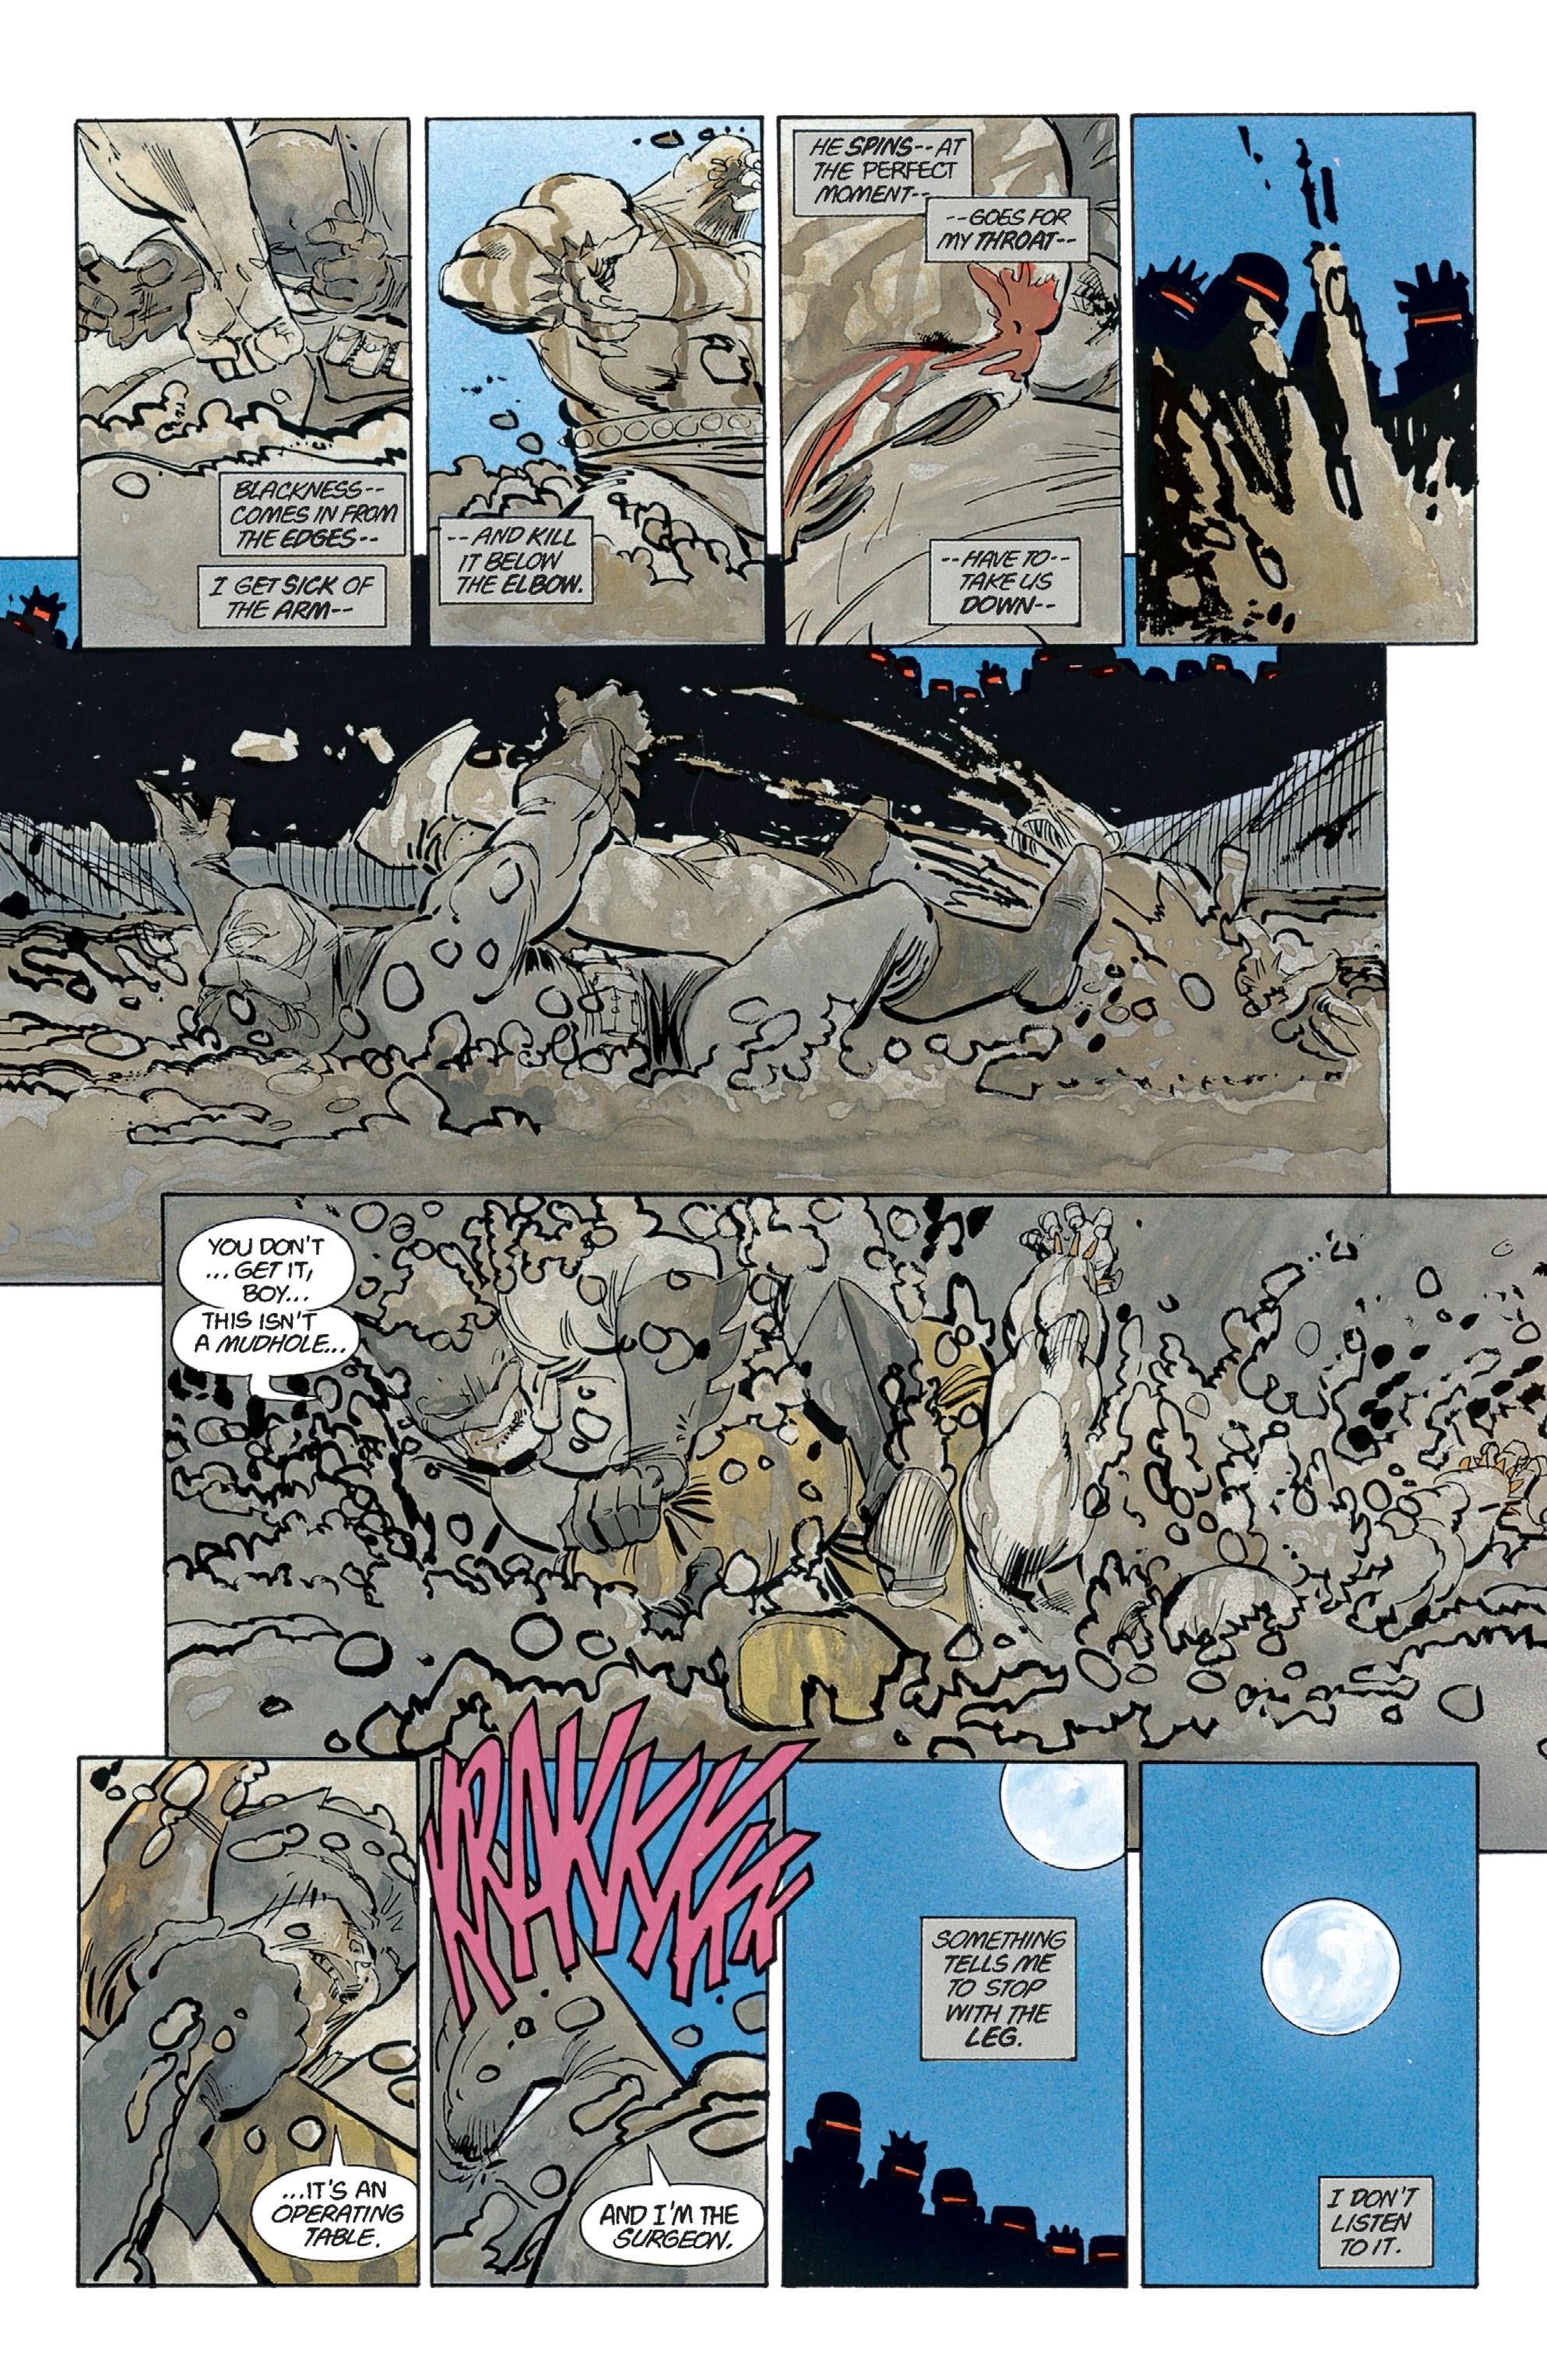 Batman: The Dark Knight Returns _30th_Anniversary_Edition_(Part_2) Page 1